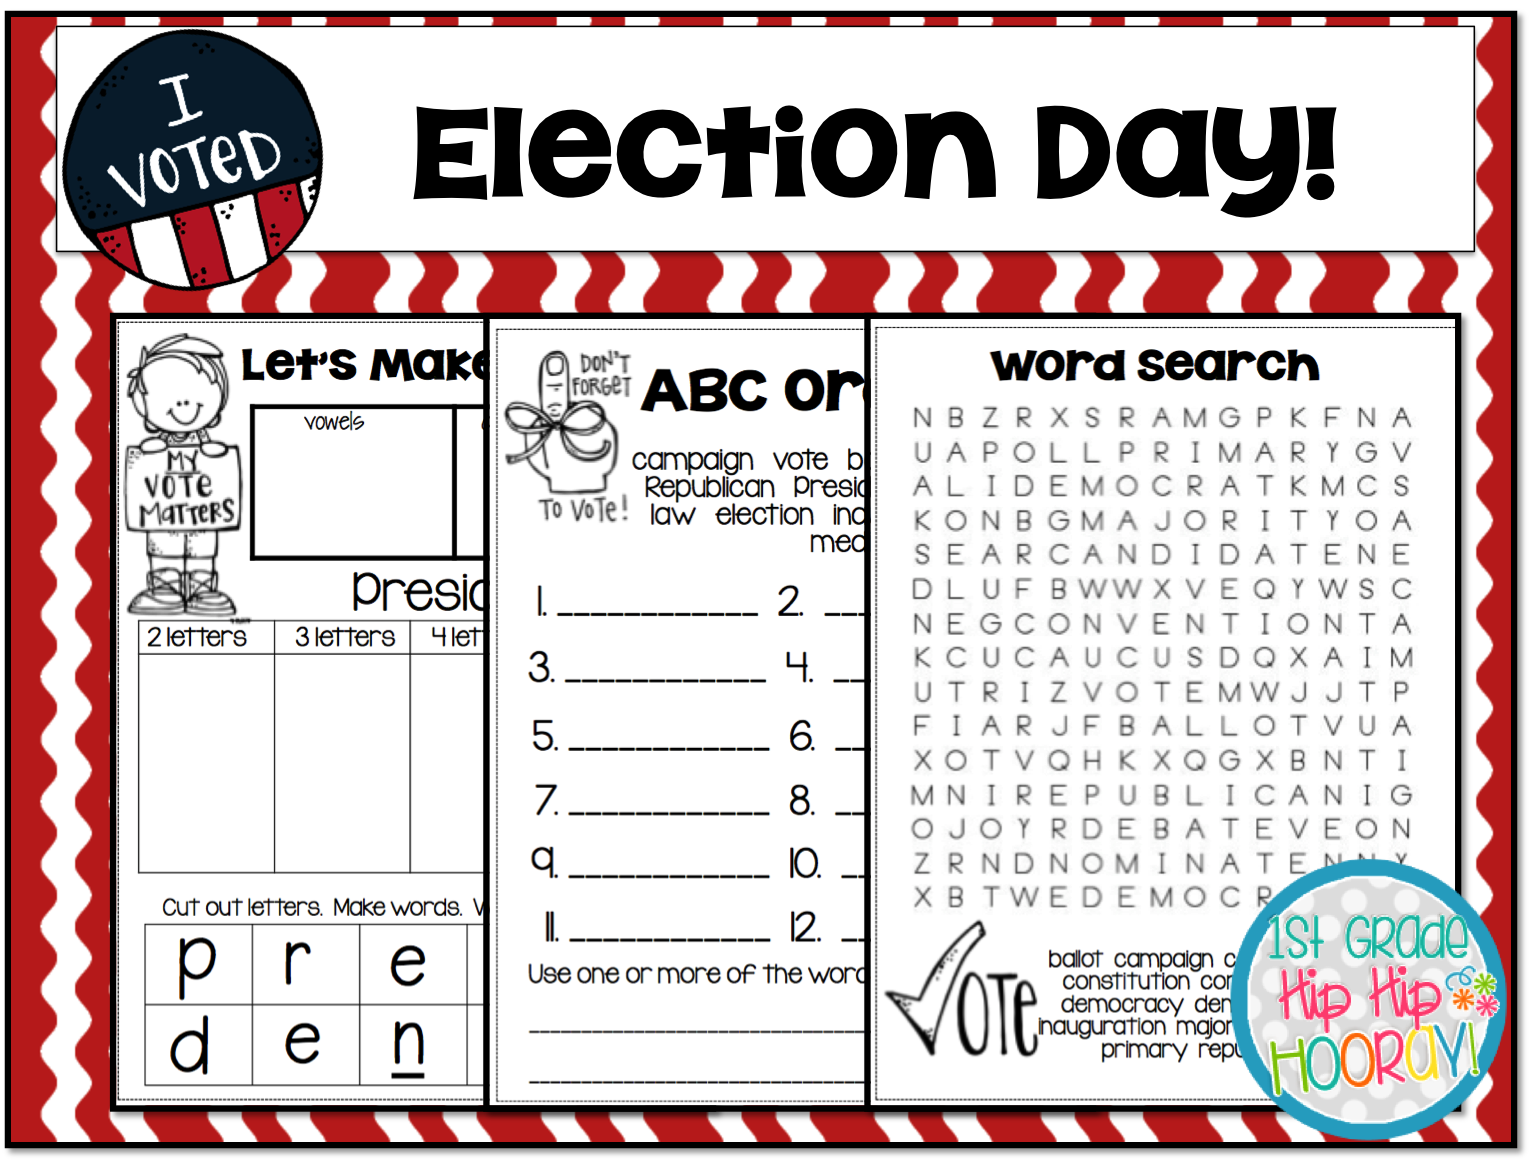 1st Grade Hip Hip Hooray!: Election Day...November 7th!